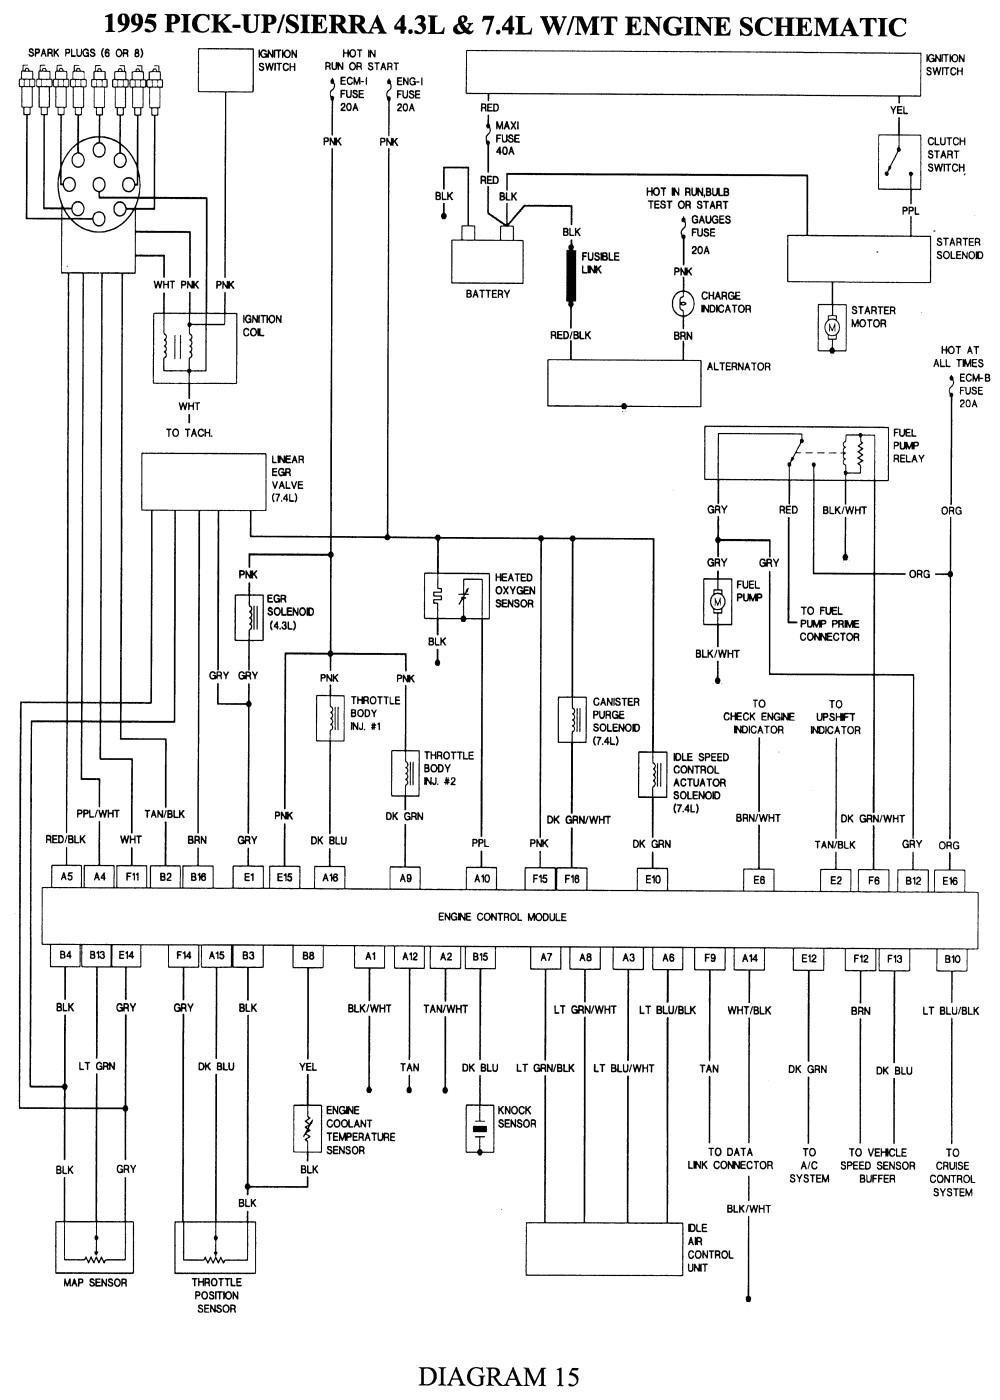 tail light wiring diagram 1995 chevy truck 2018 types of silverado gif